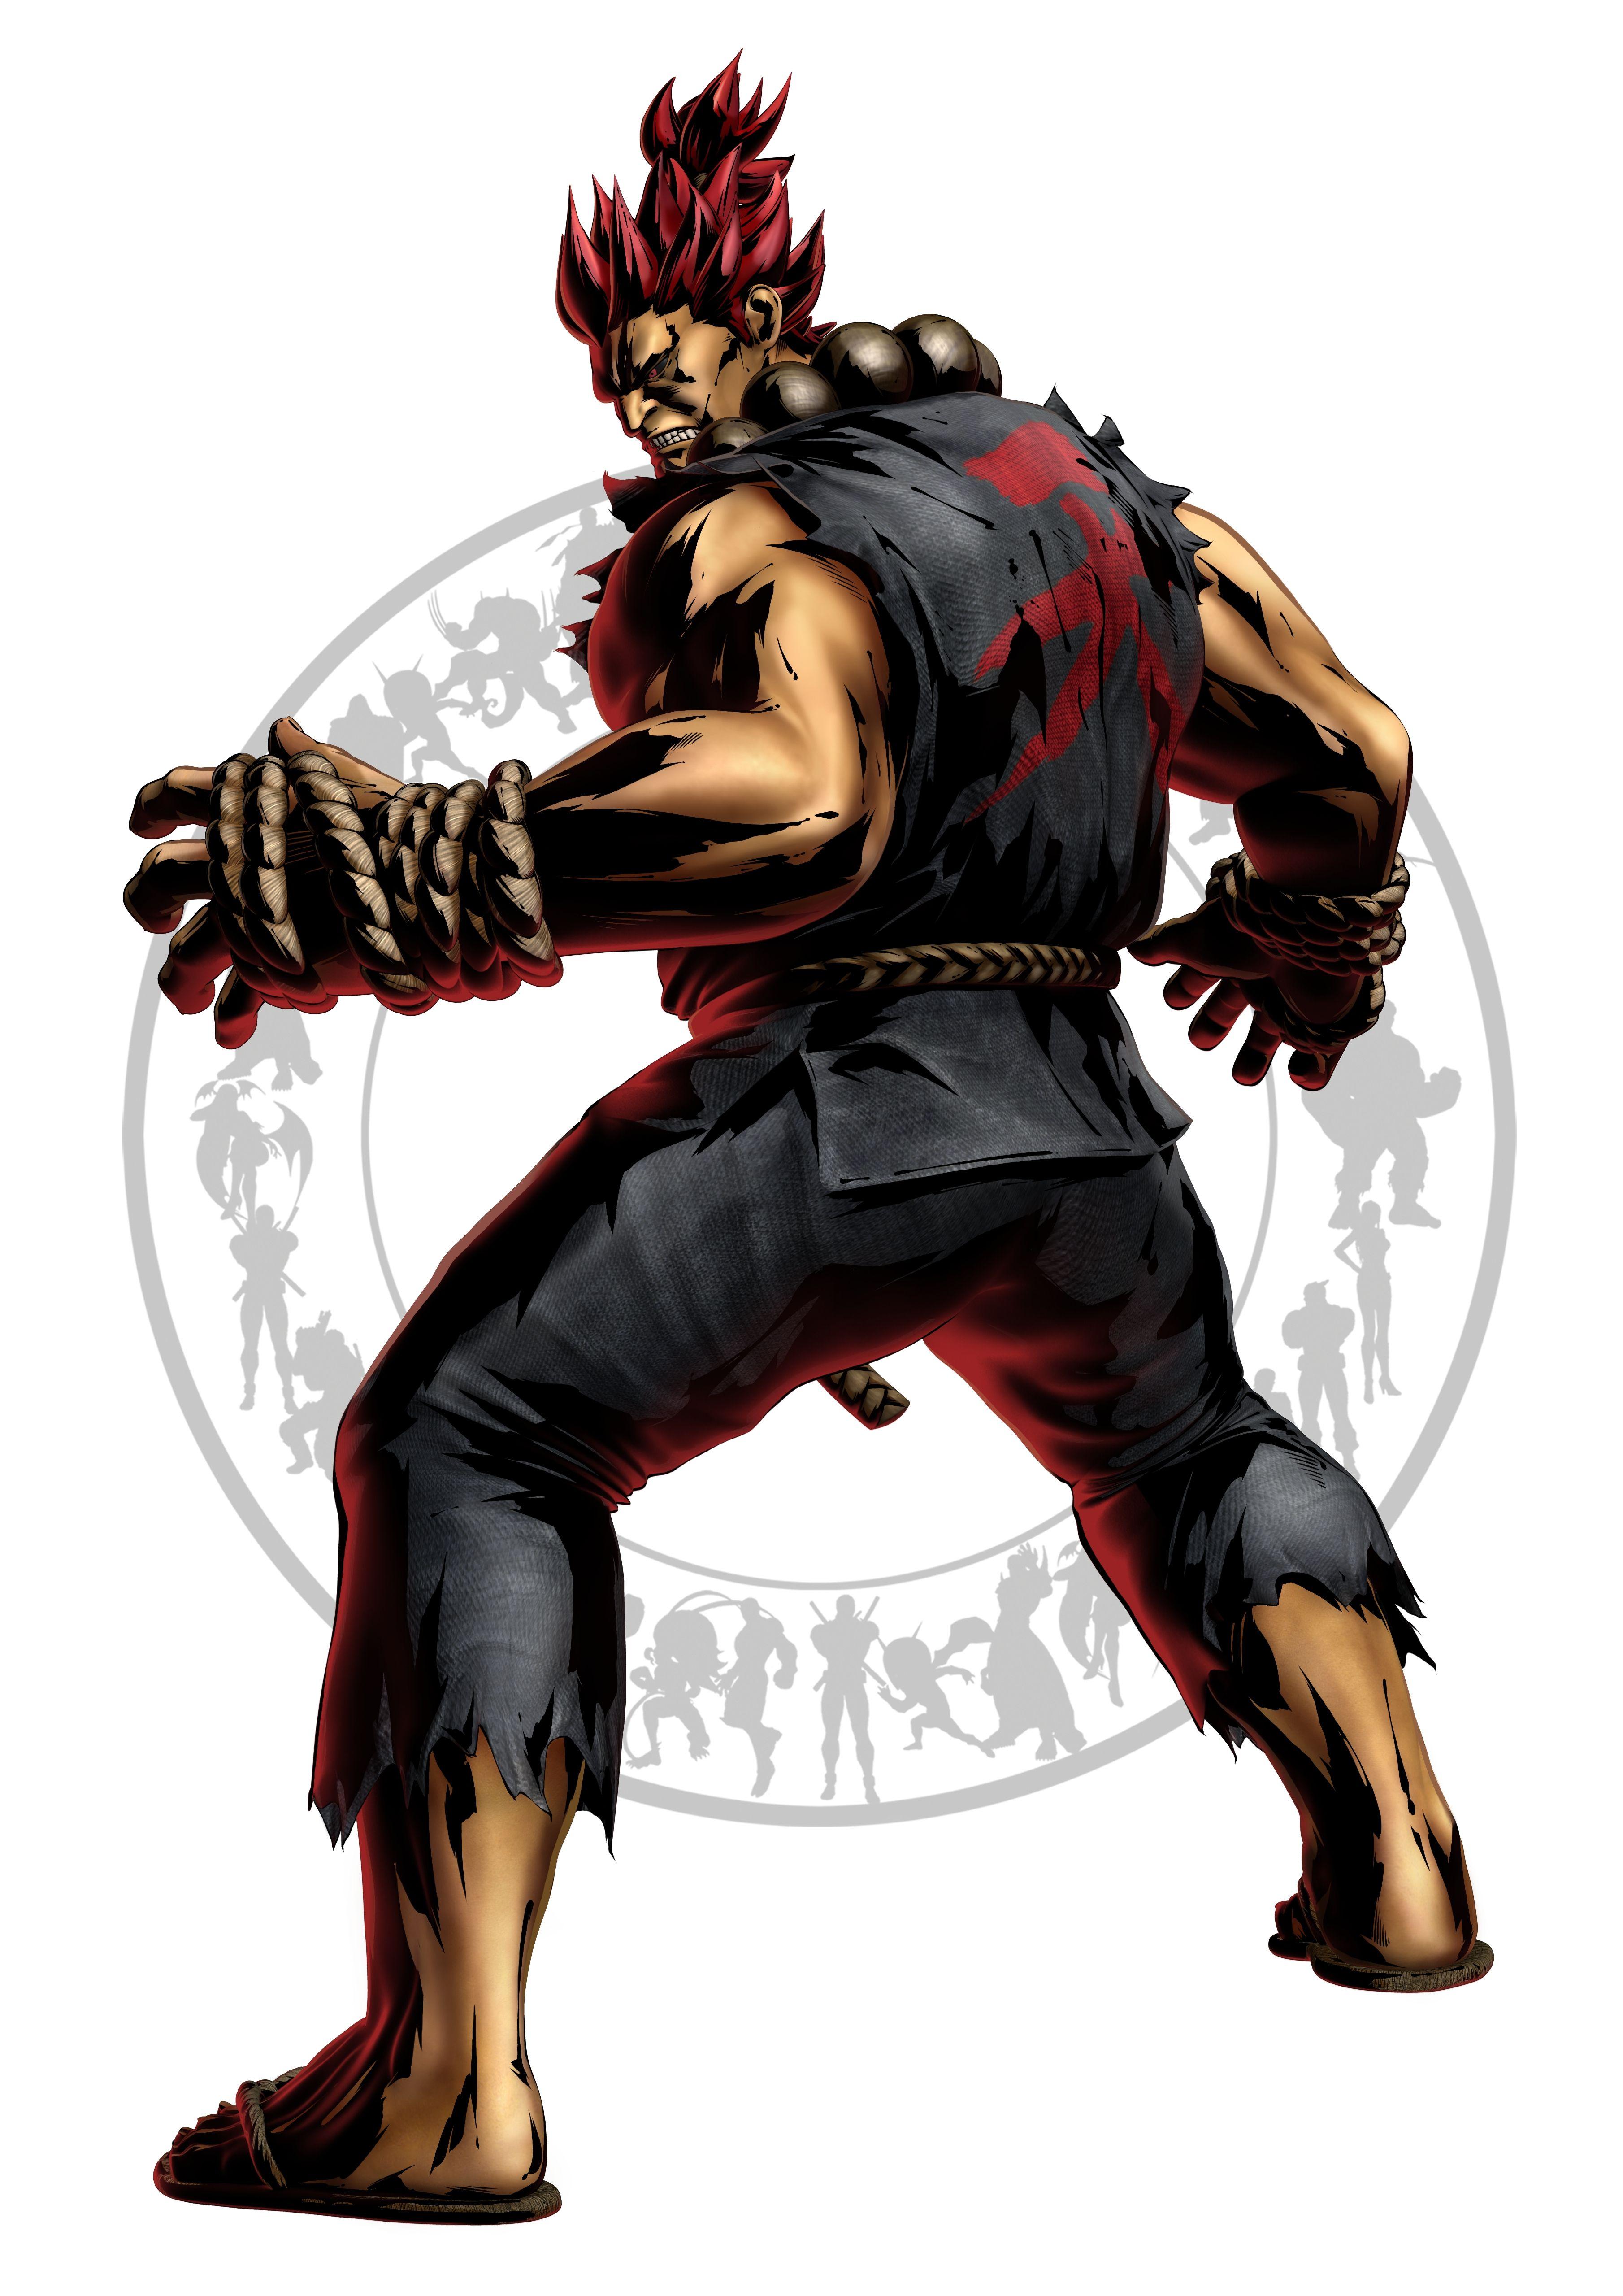 Акума - Marvel vs. Capcom 3: Fate of Two Worlds Арт, Персонаж